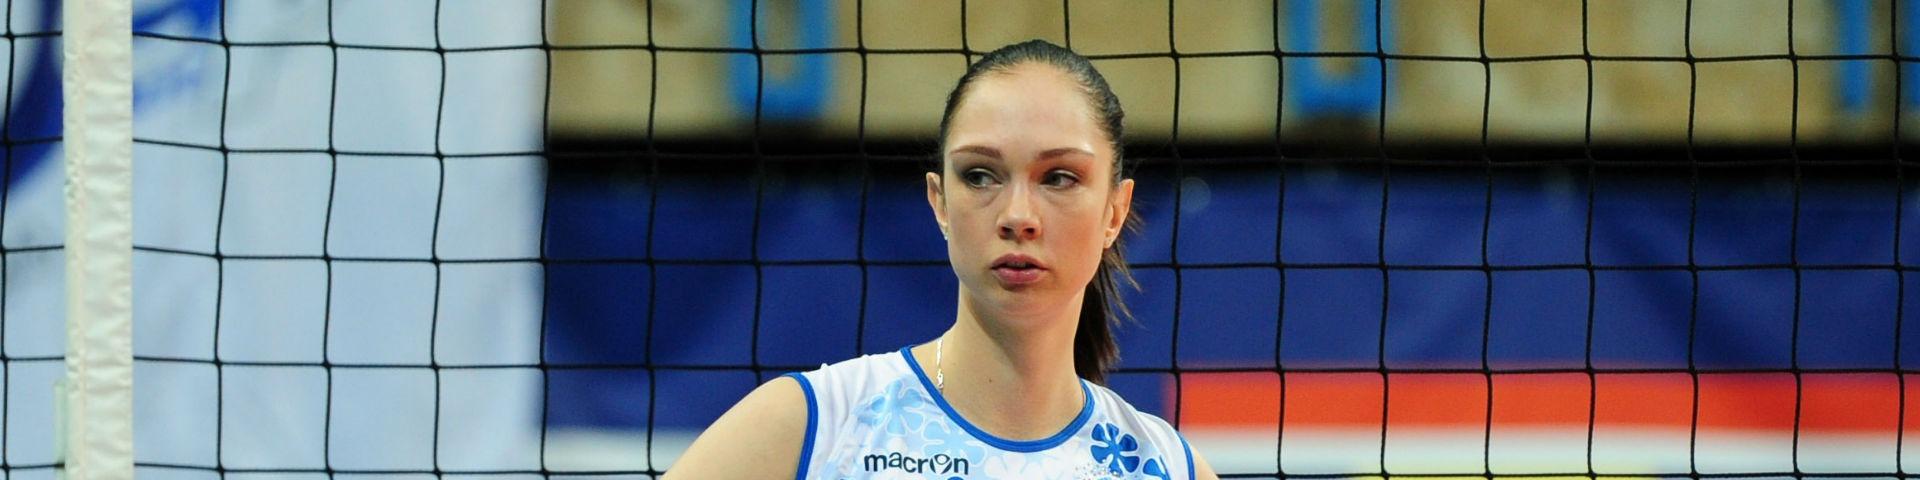 Екатерина Гамова стала послом бренда БК «Париматч»